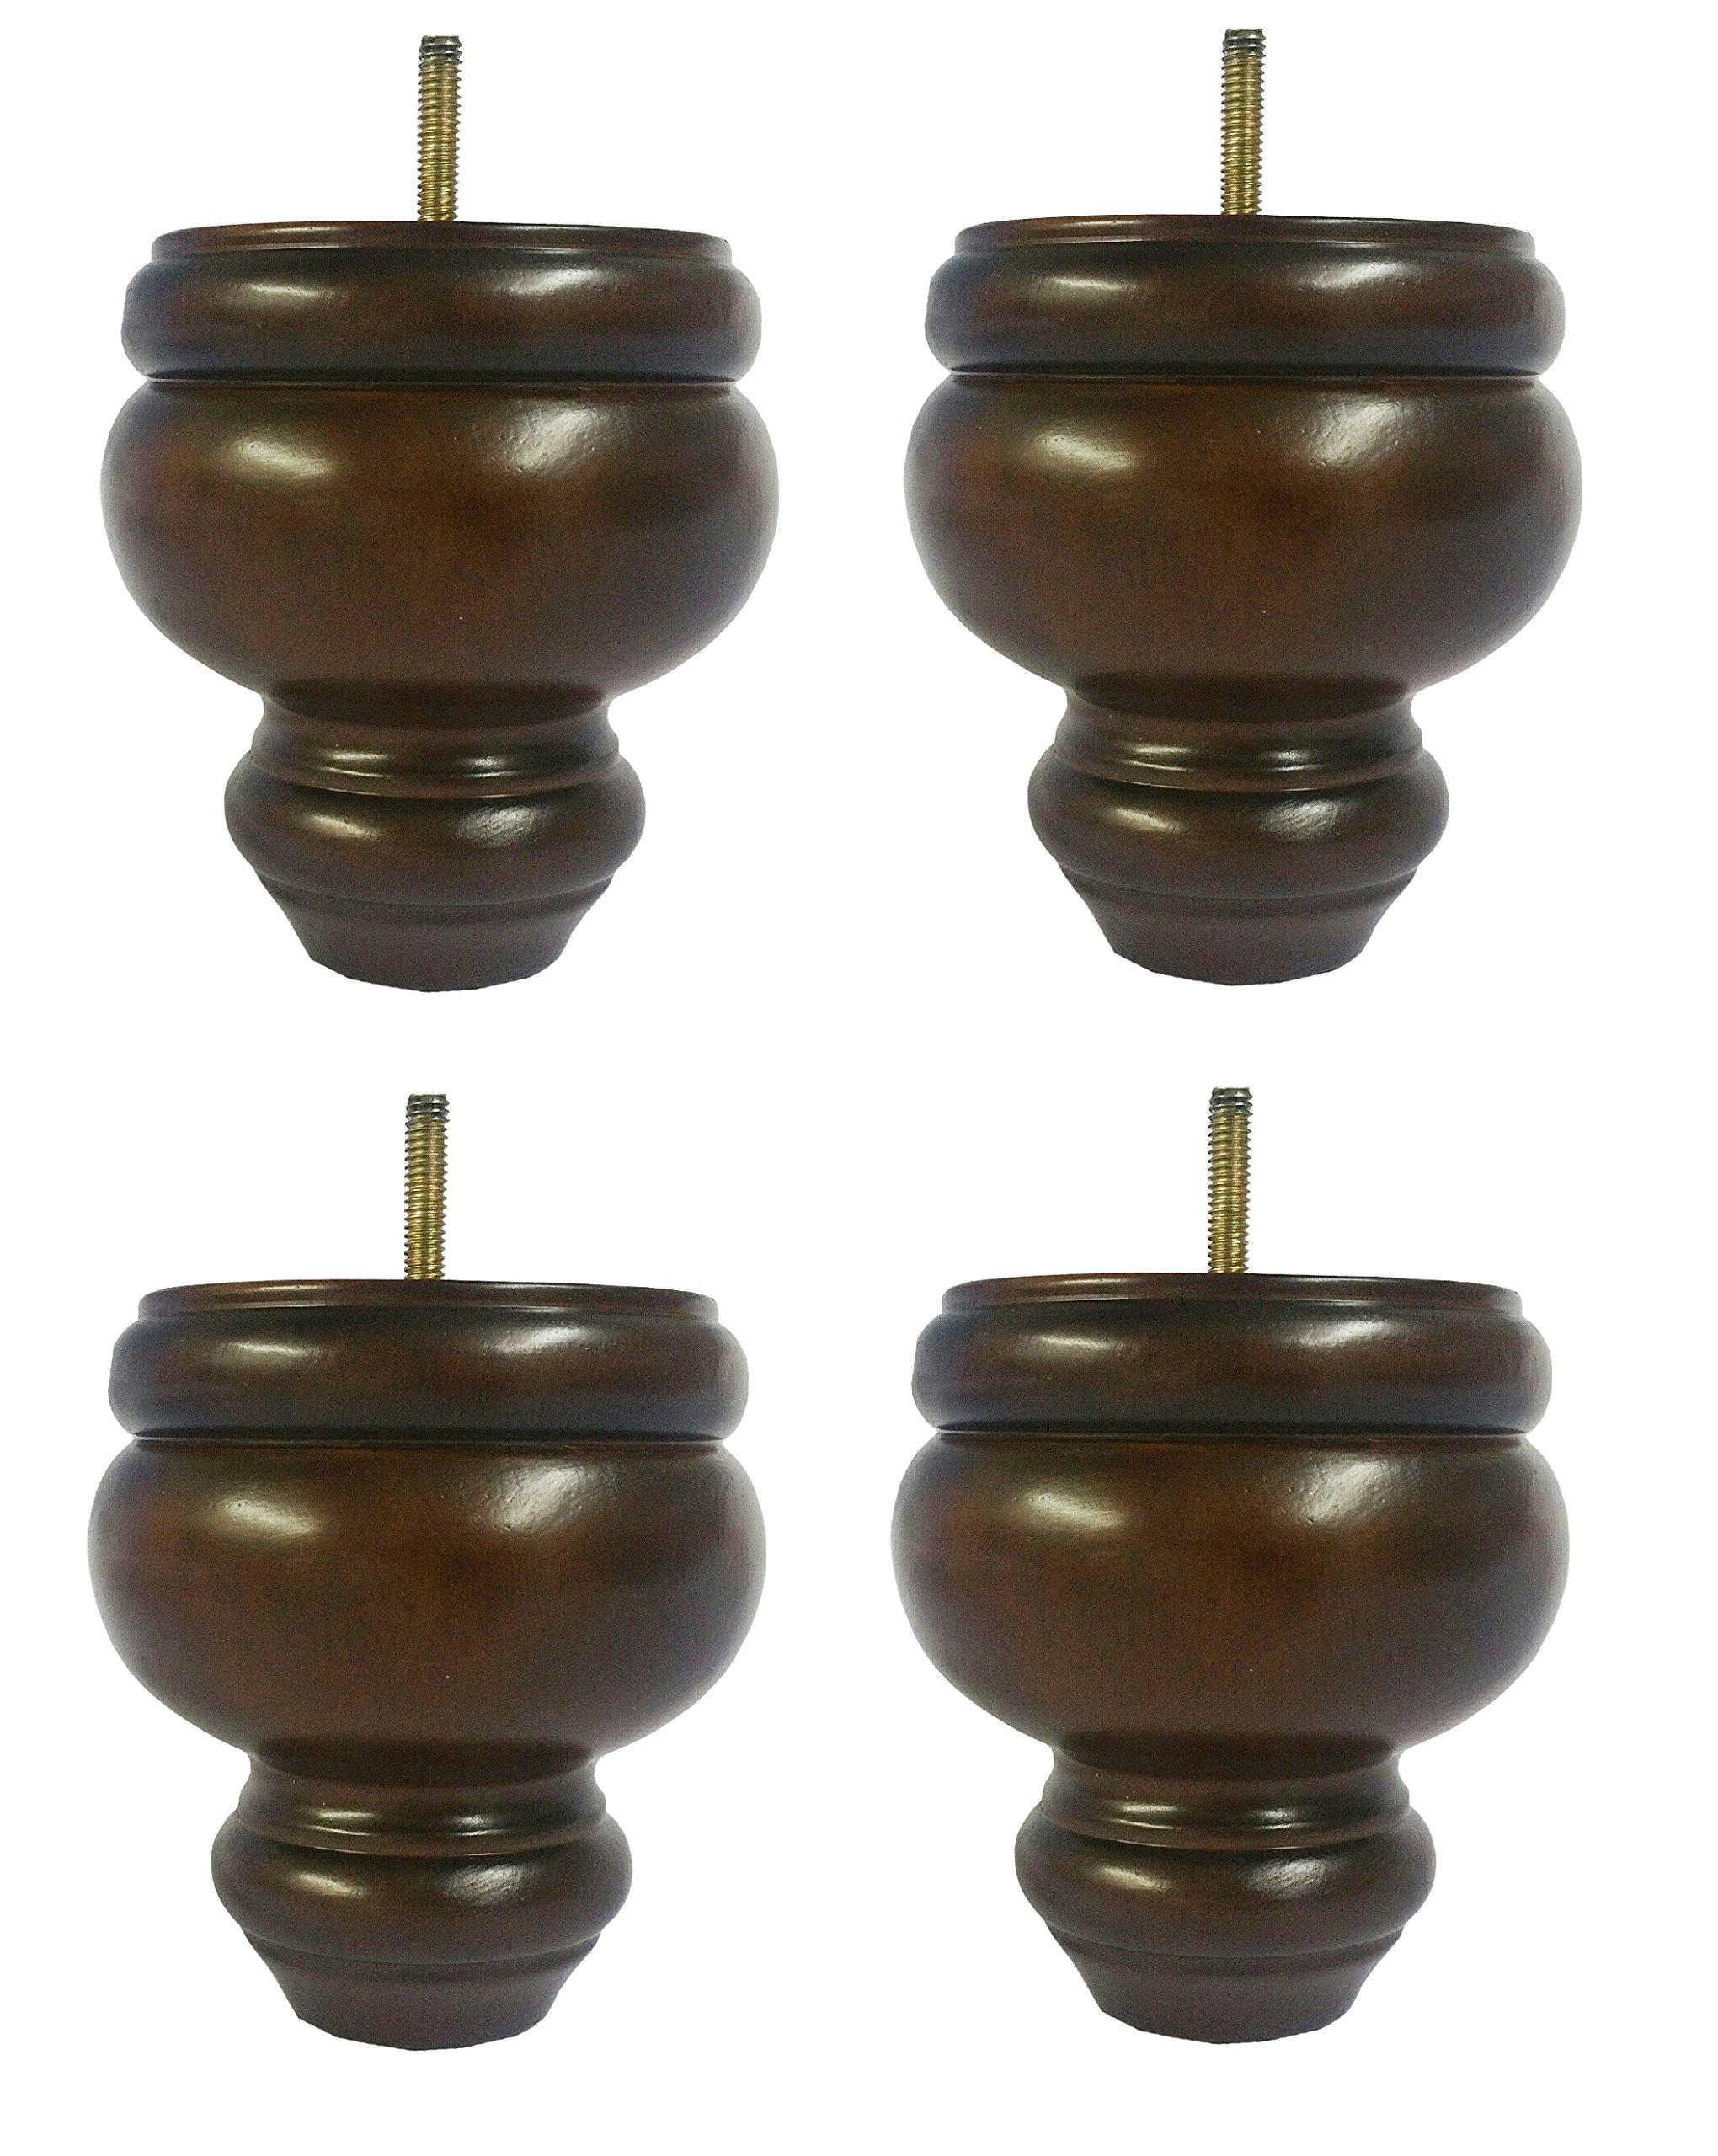 Elegent Upholstery 5'' Buns Dark Walnut Sofa/Couch/Ottoman Wood Legs 5/16 Thread - Set of 4